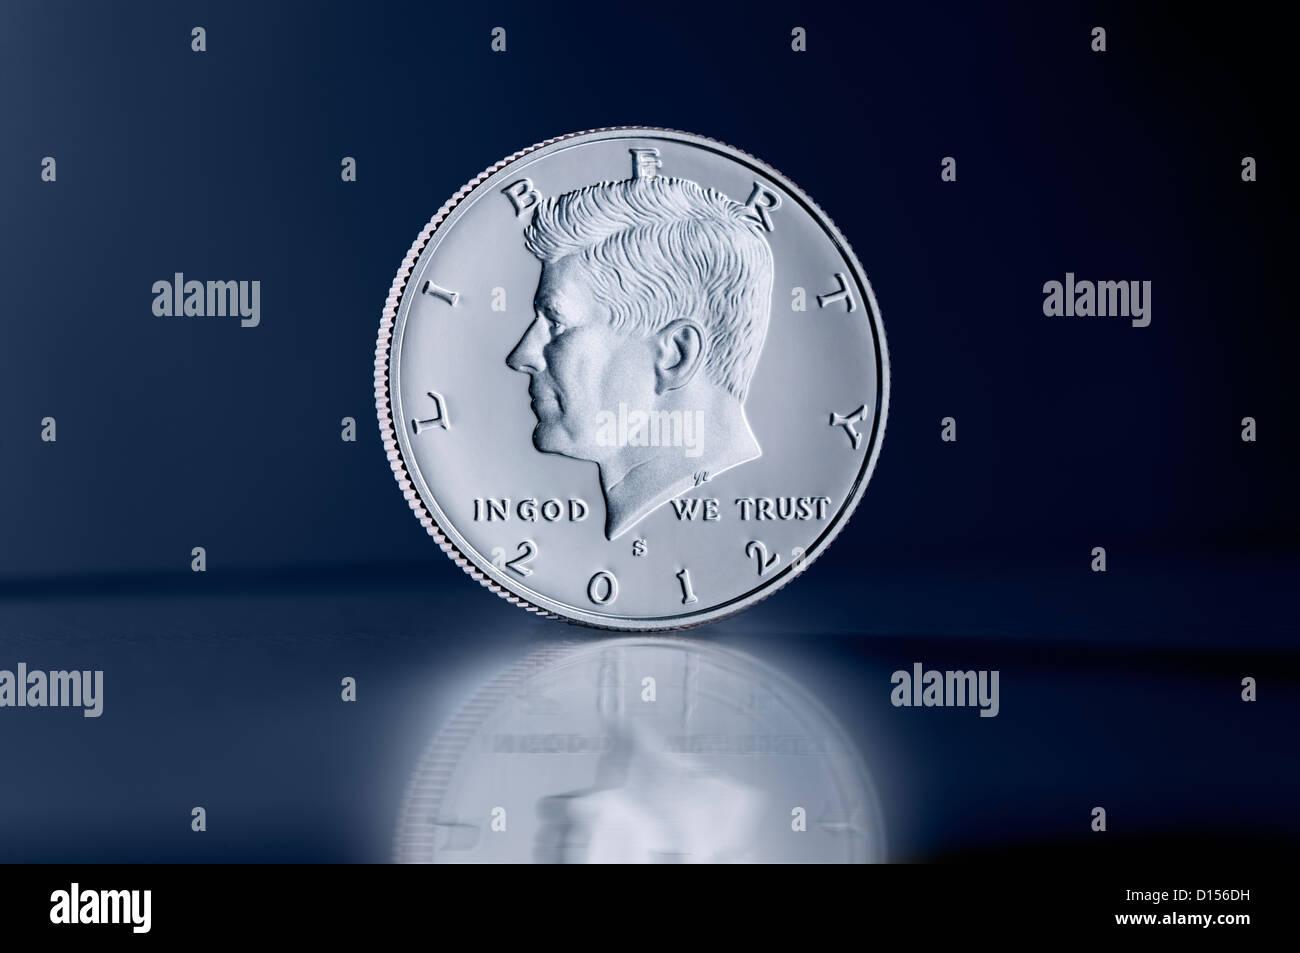 Upright Kennedy Half Dollar coin against dark background - Stock Image